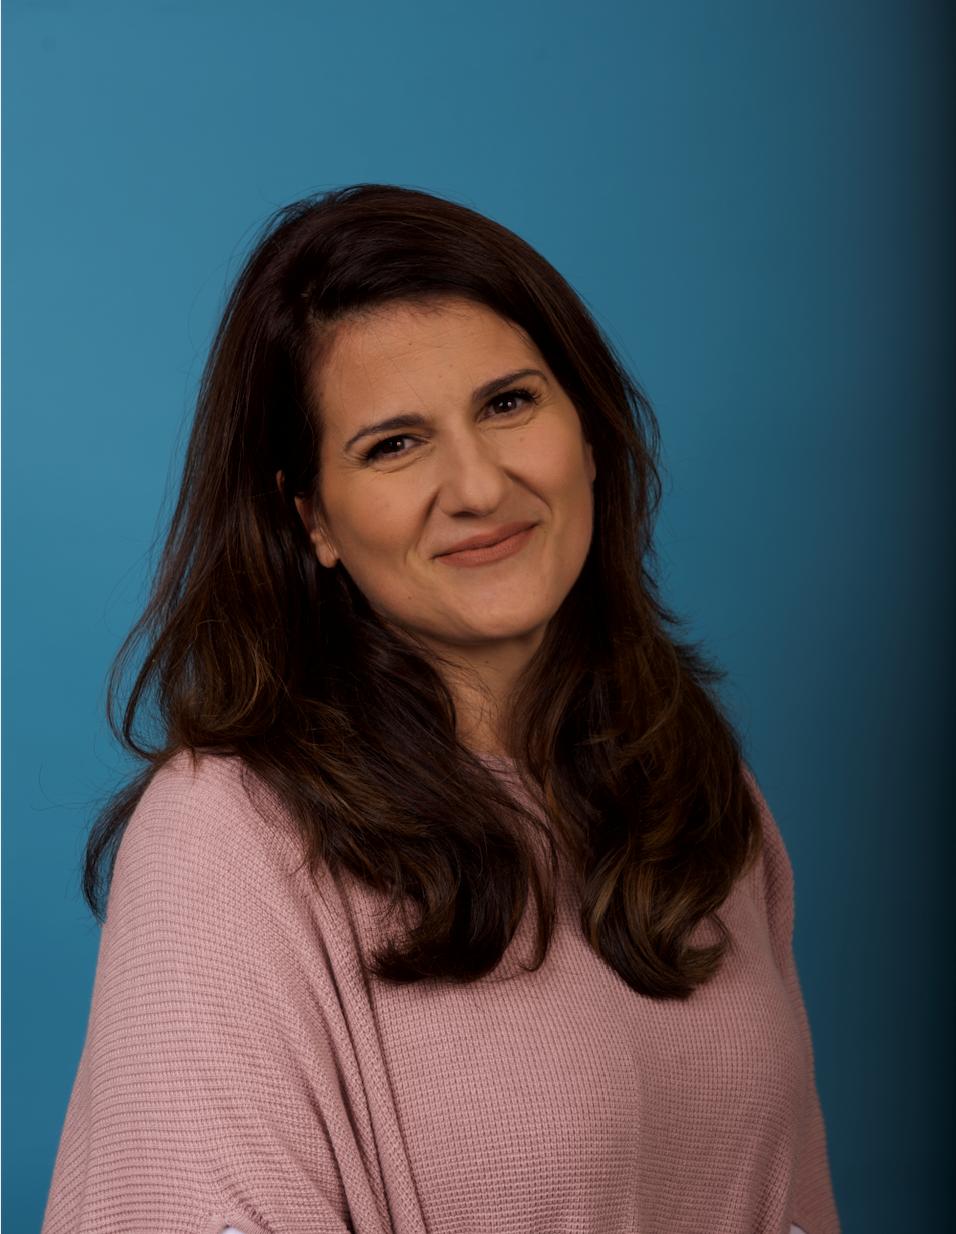 Linda Hovanessian